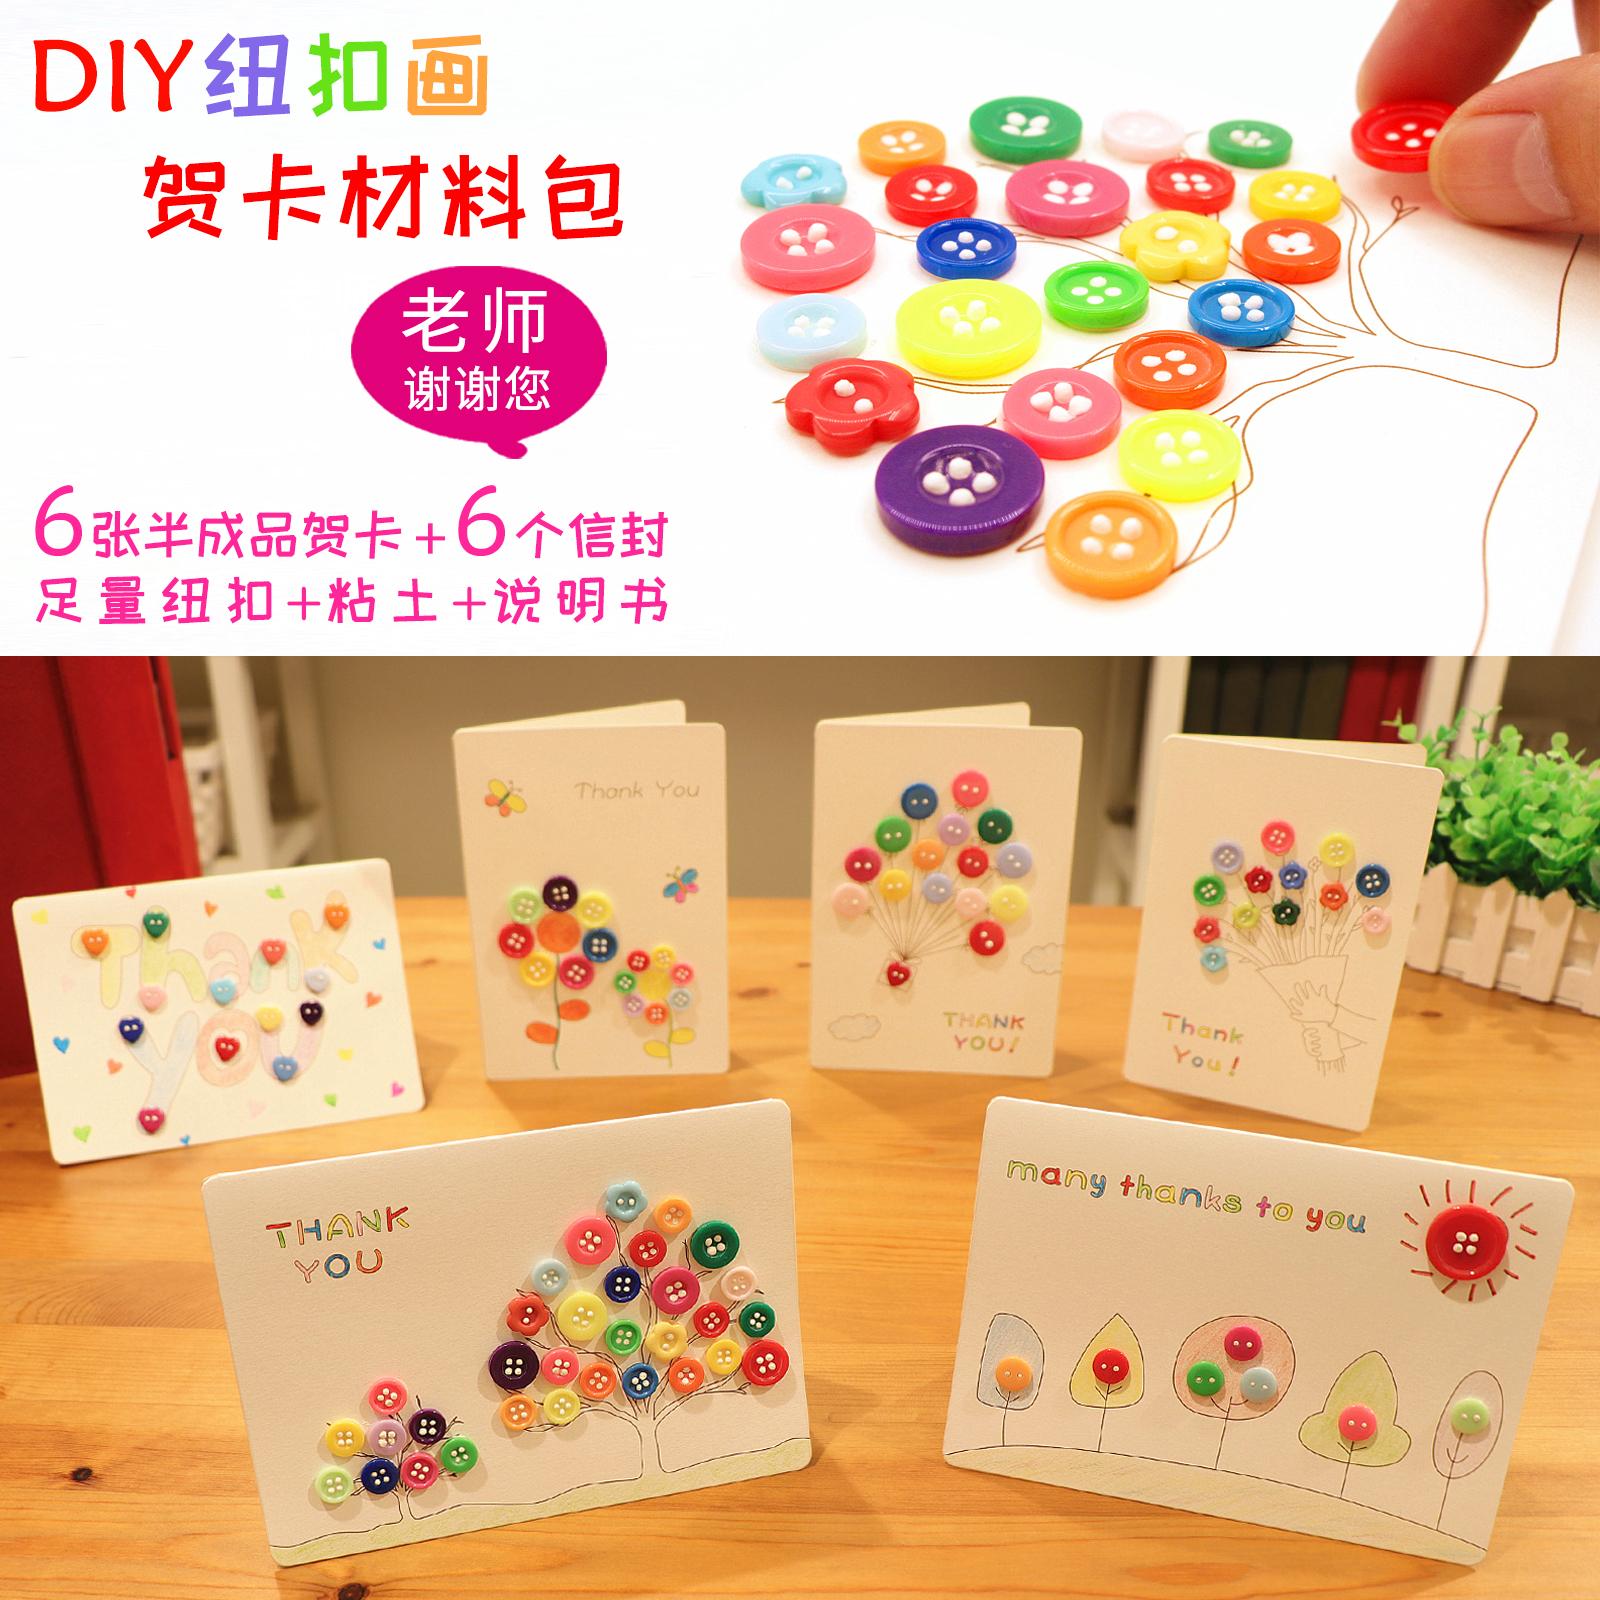 Diy Greeting Card Handmade Material Package Teachers Day Graduation